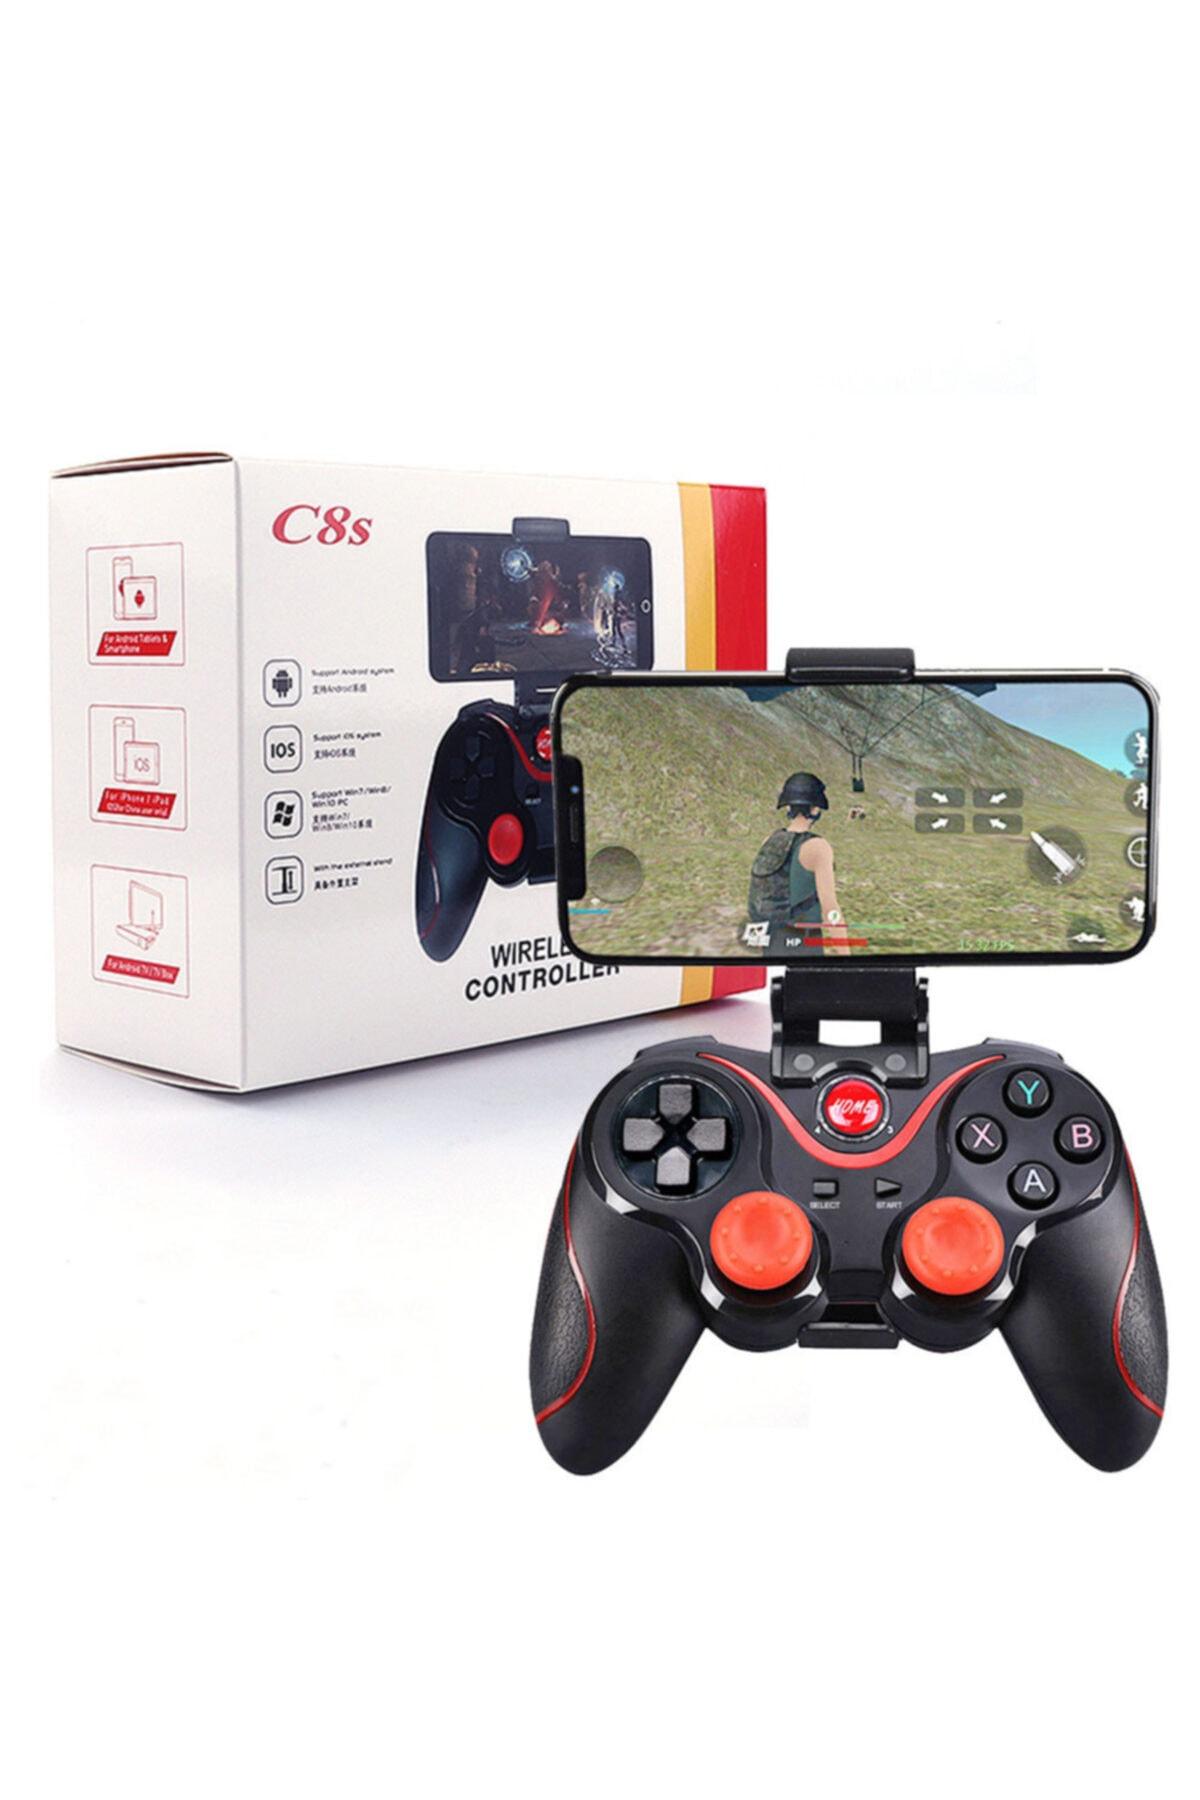 PUBG C8s Wireless Kablosuz Oyun Kolu Bluetooth Joystick Gamepad 1